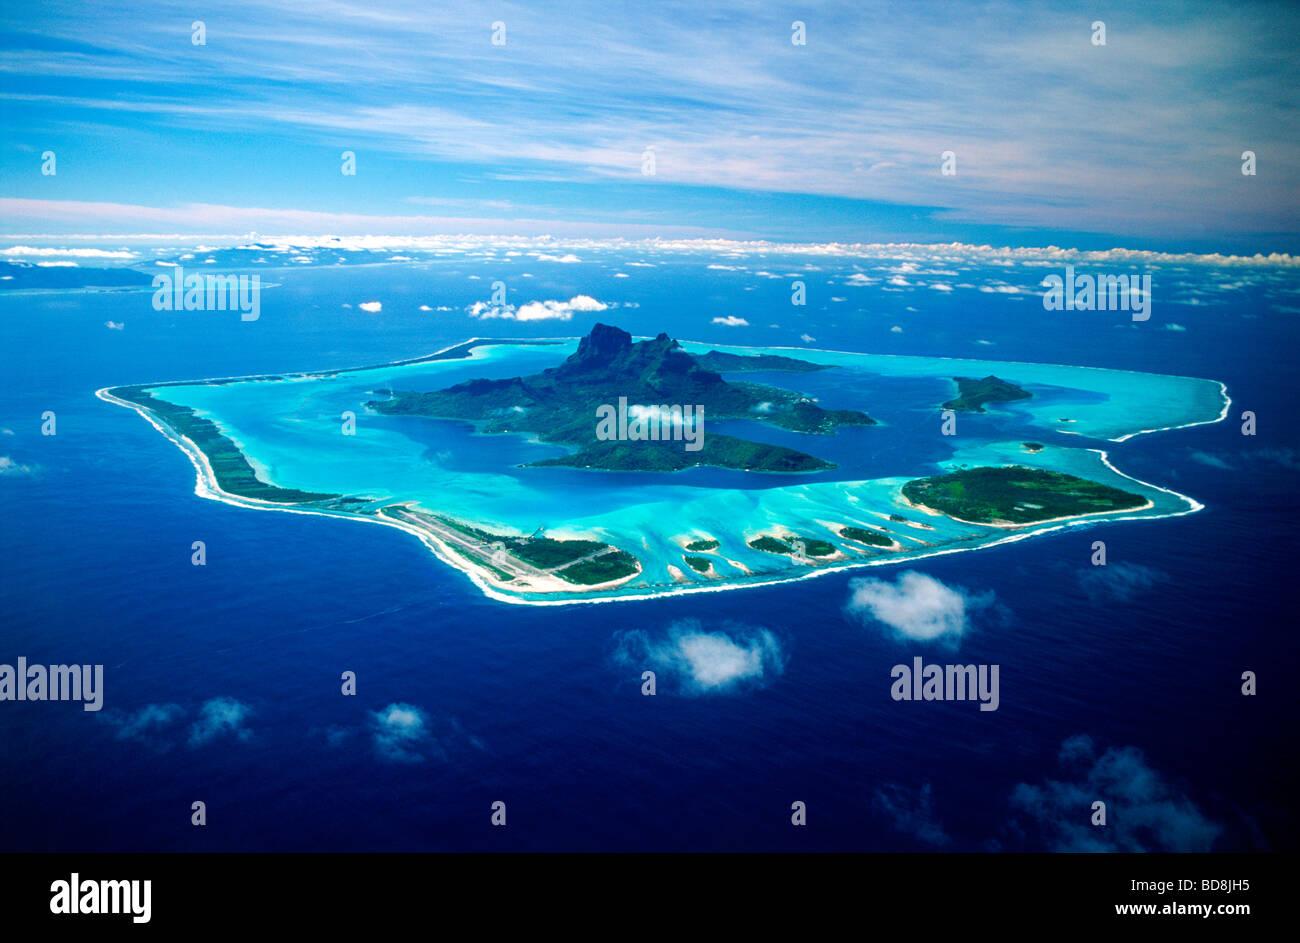 aerial-view-of-bora-bora-island-anchored